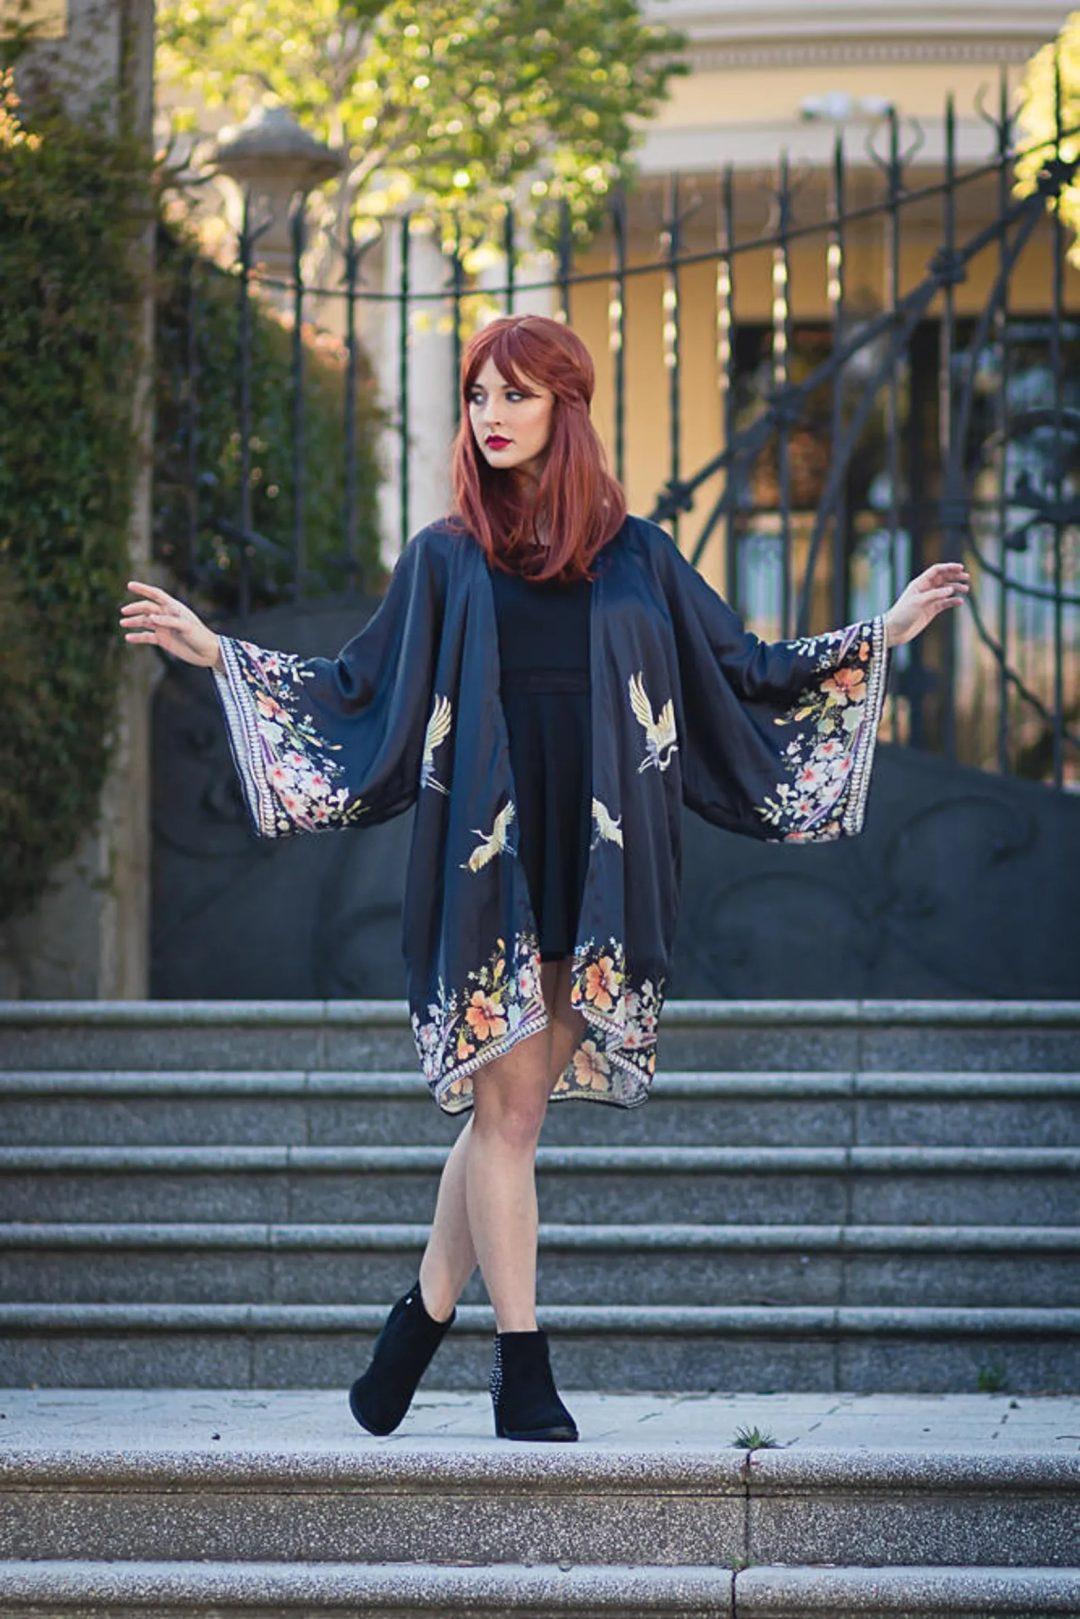 Goblincore Outfits: Dark kimono robe